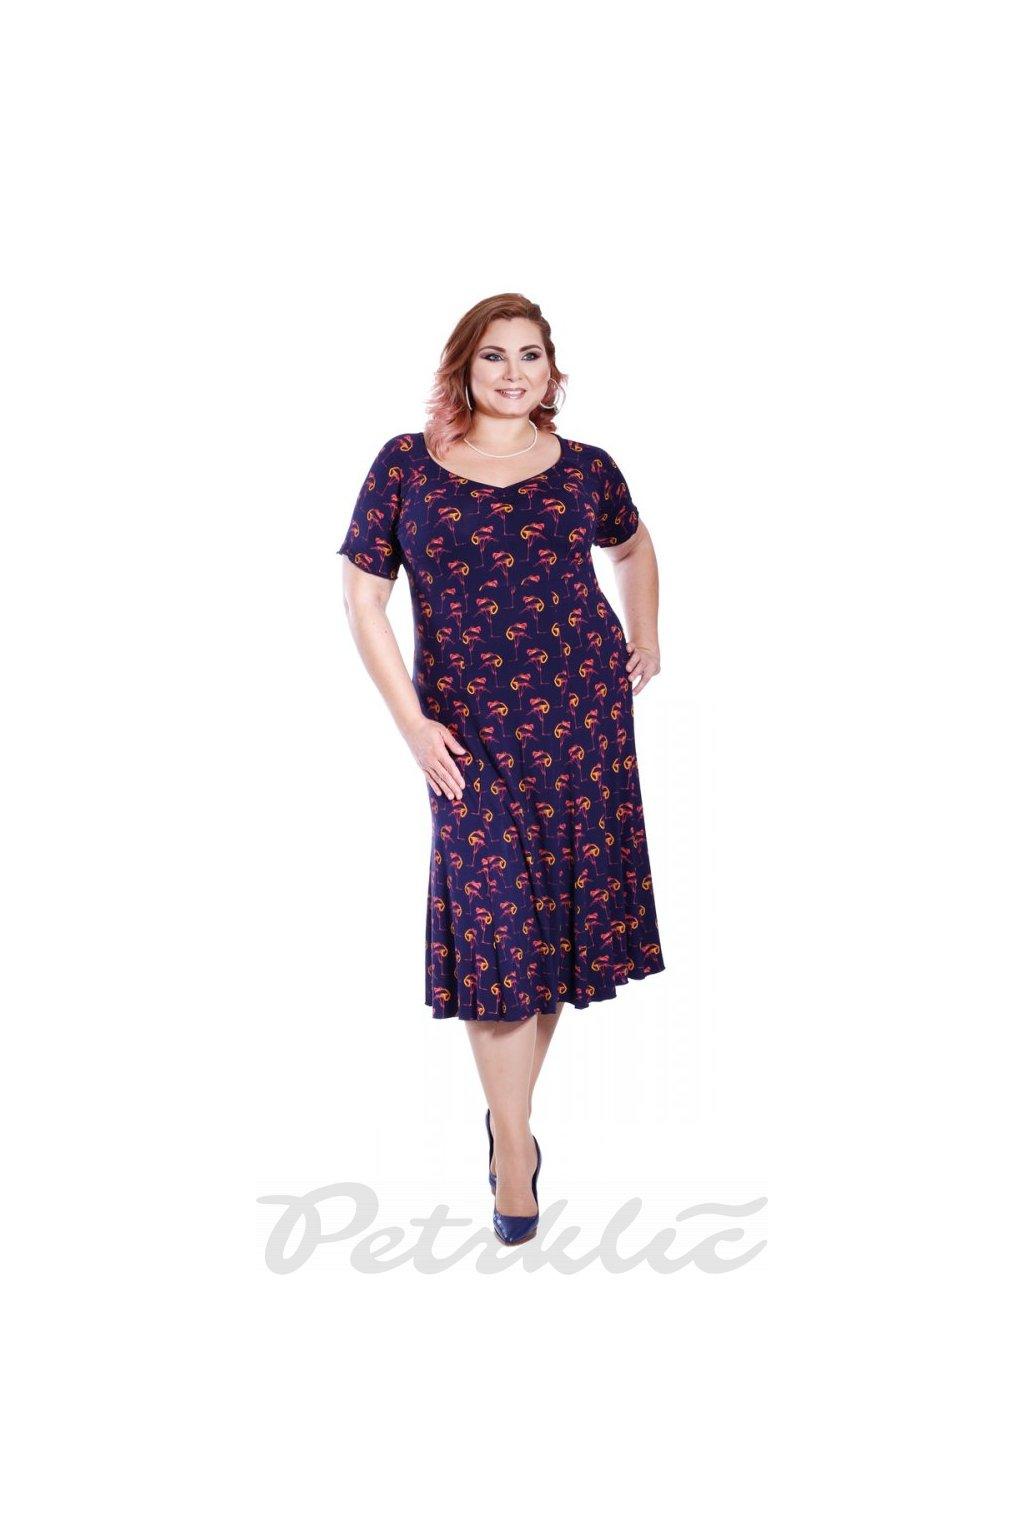 AGÁTA - šaty 100 - 105 cm